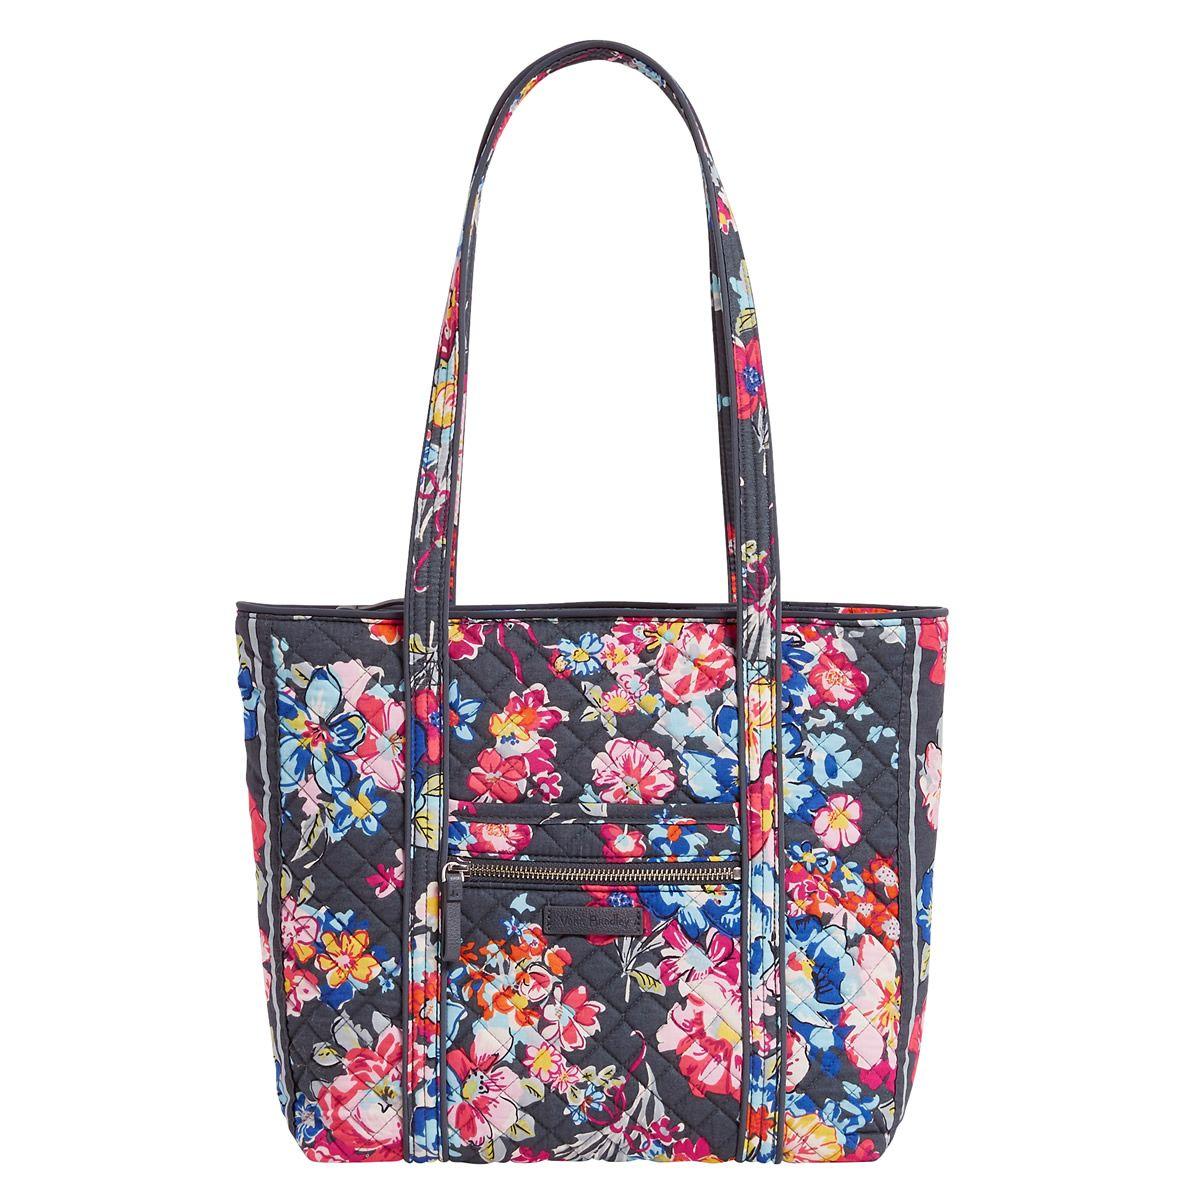 Vera Bradley Handbags - Macy s 142bbc1b27c3a